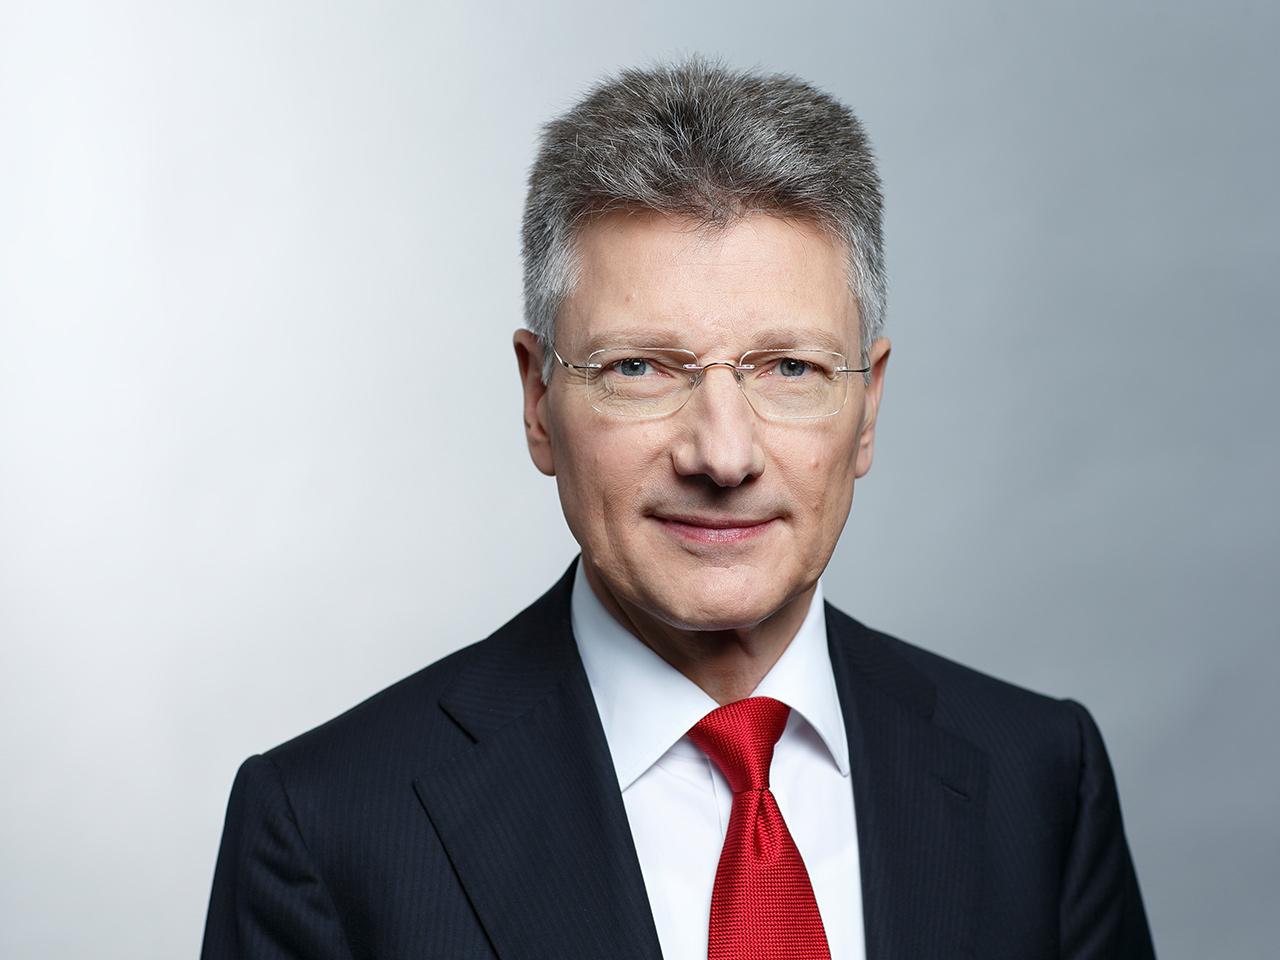 Vorstandschef Elmar Degenhart. (Bild: Continental)